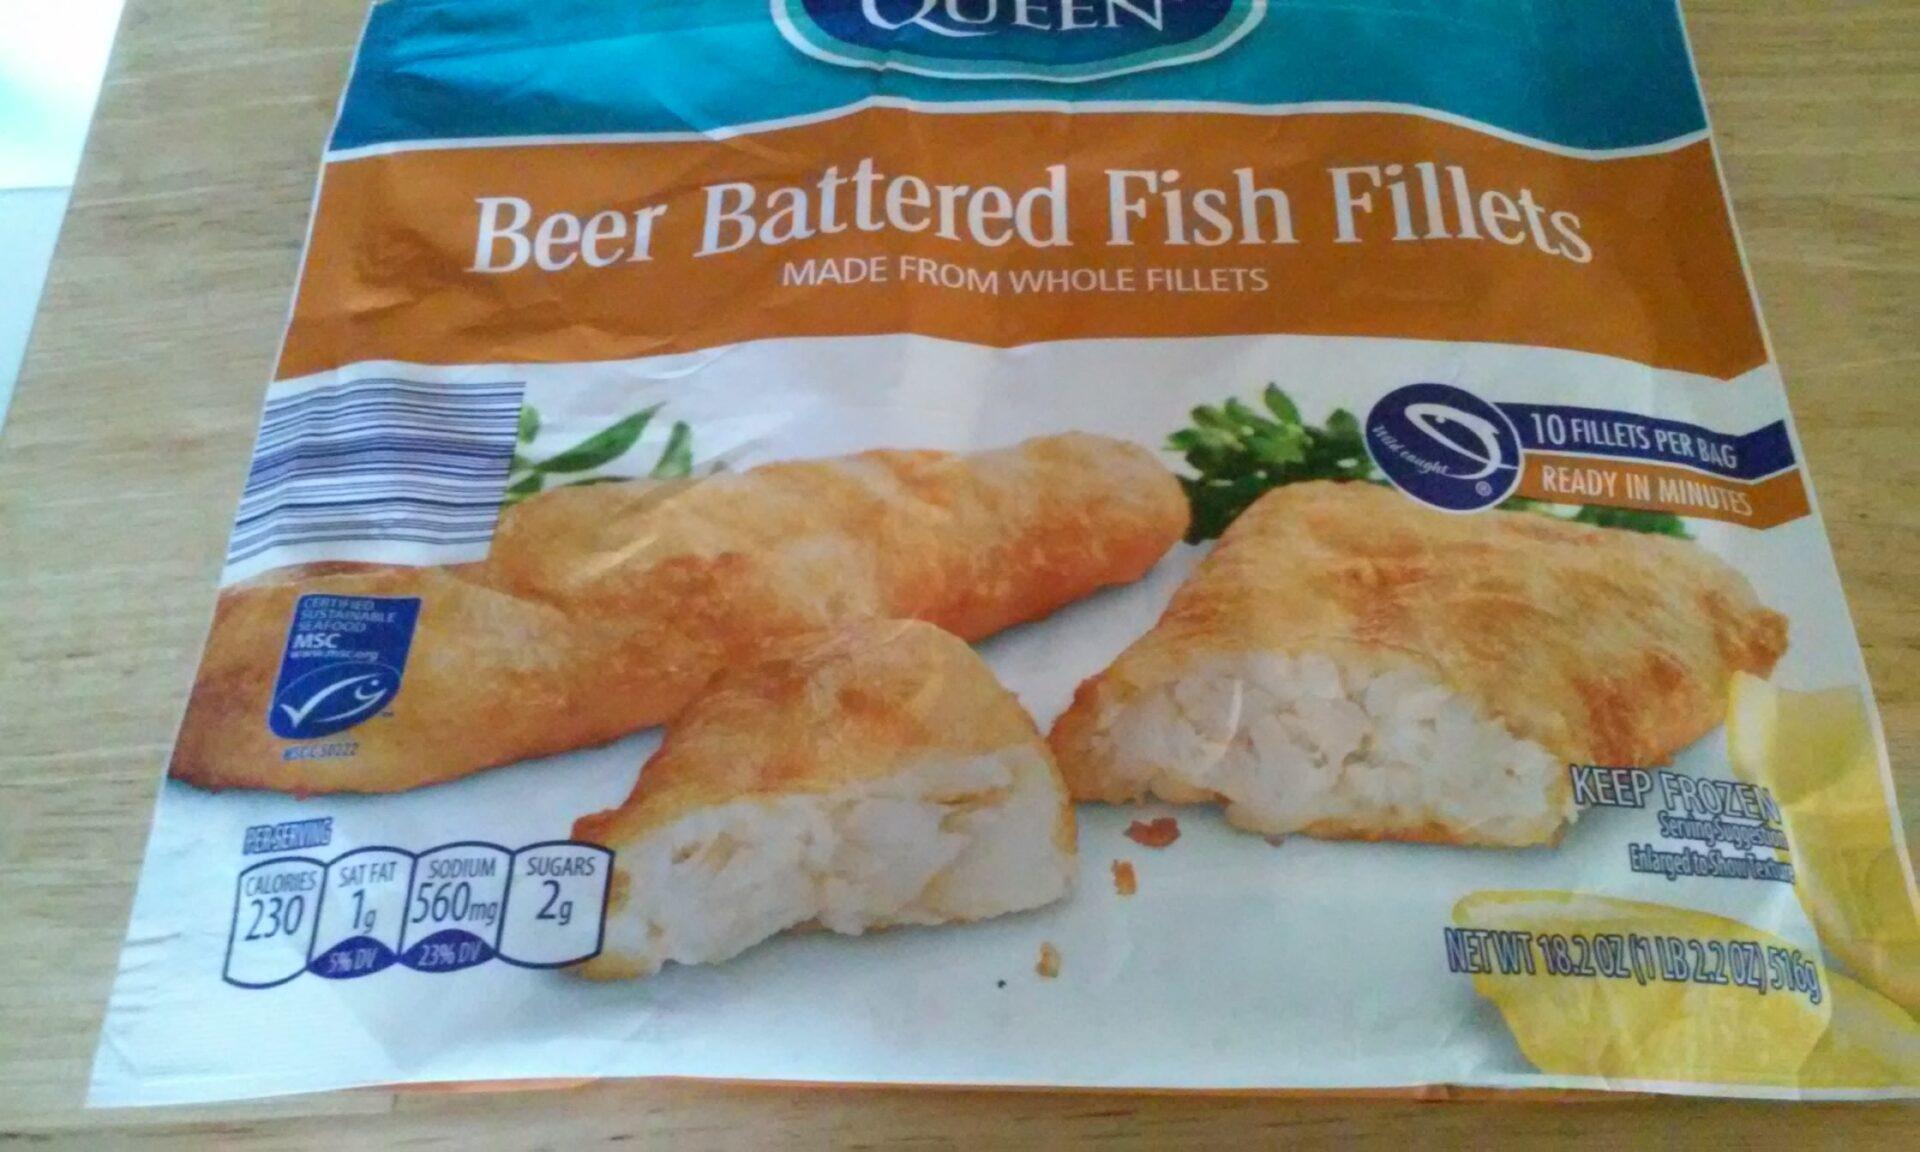 Sea Queen Beer Battered Fish Fillets | ALDI REVIEWER